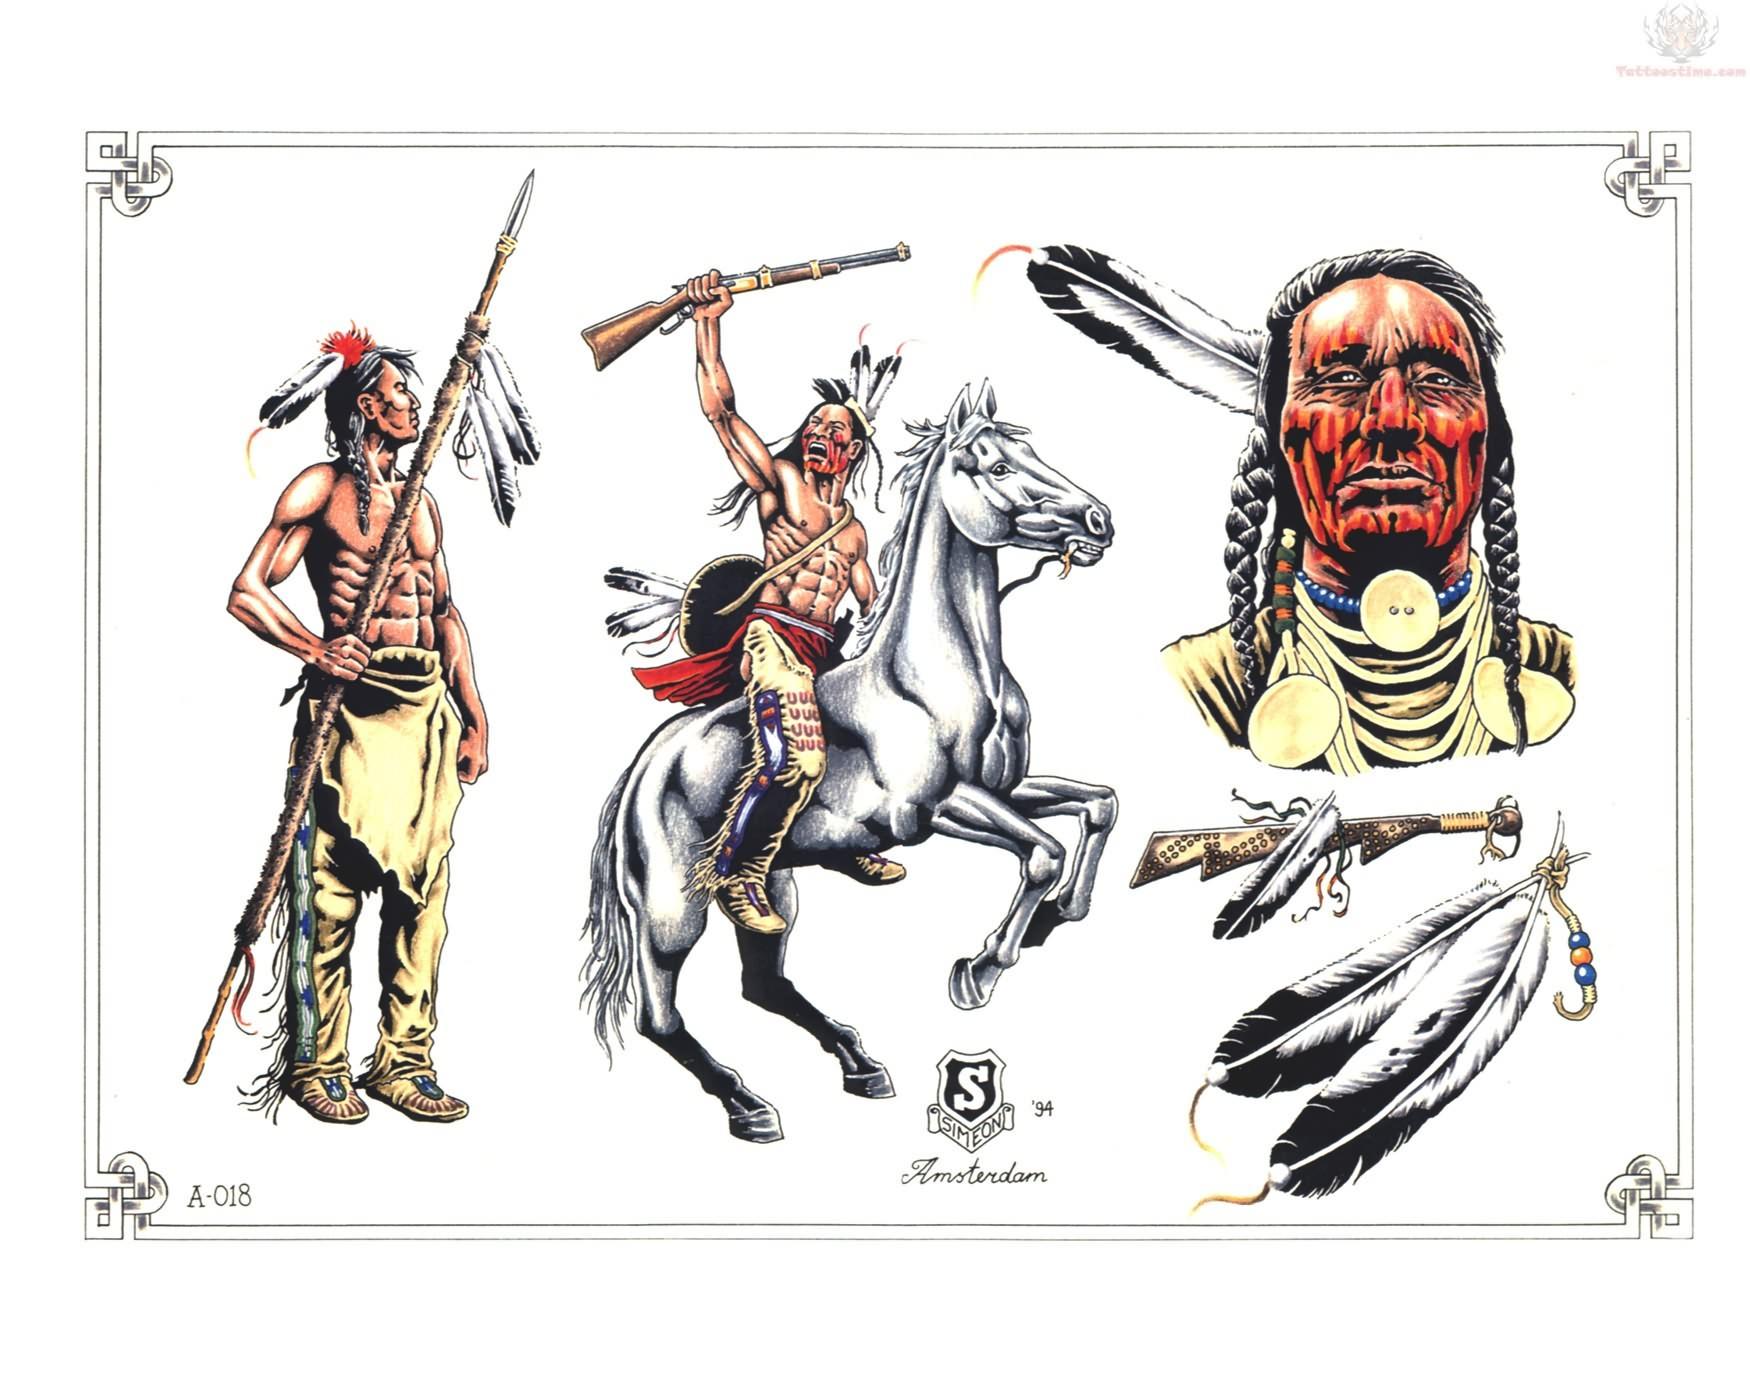 native american tattoos samples. Black Bedroom Furniture Sets. Home Design Ideas